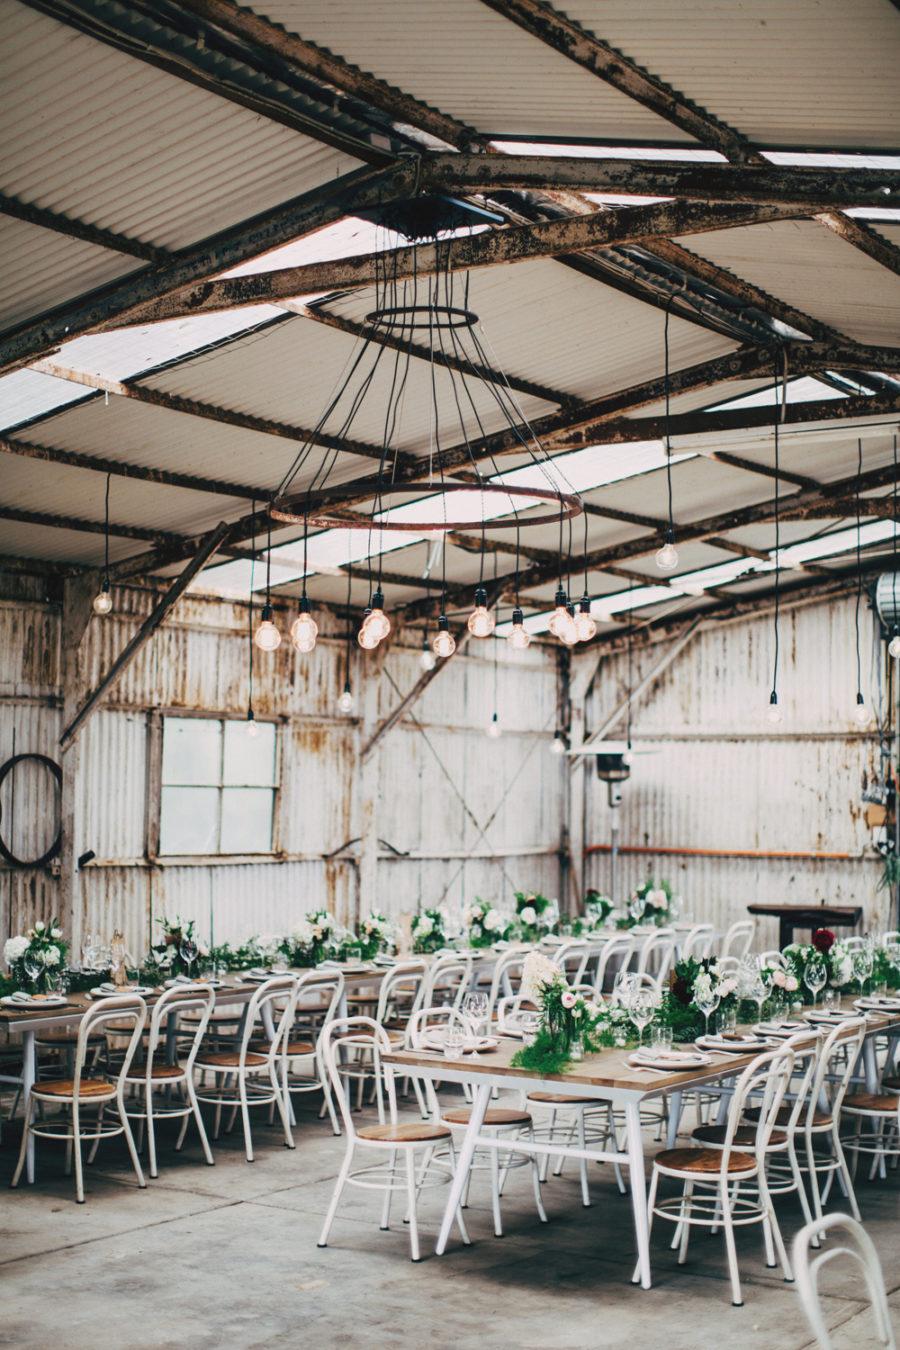 Boho Pins: Top 10 Pins of the Week - Industrial and Warehouse Weddings